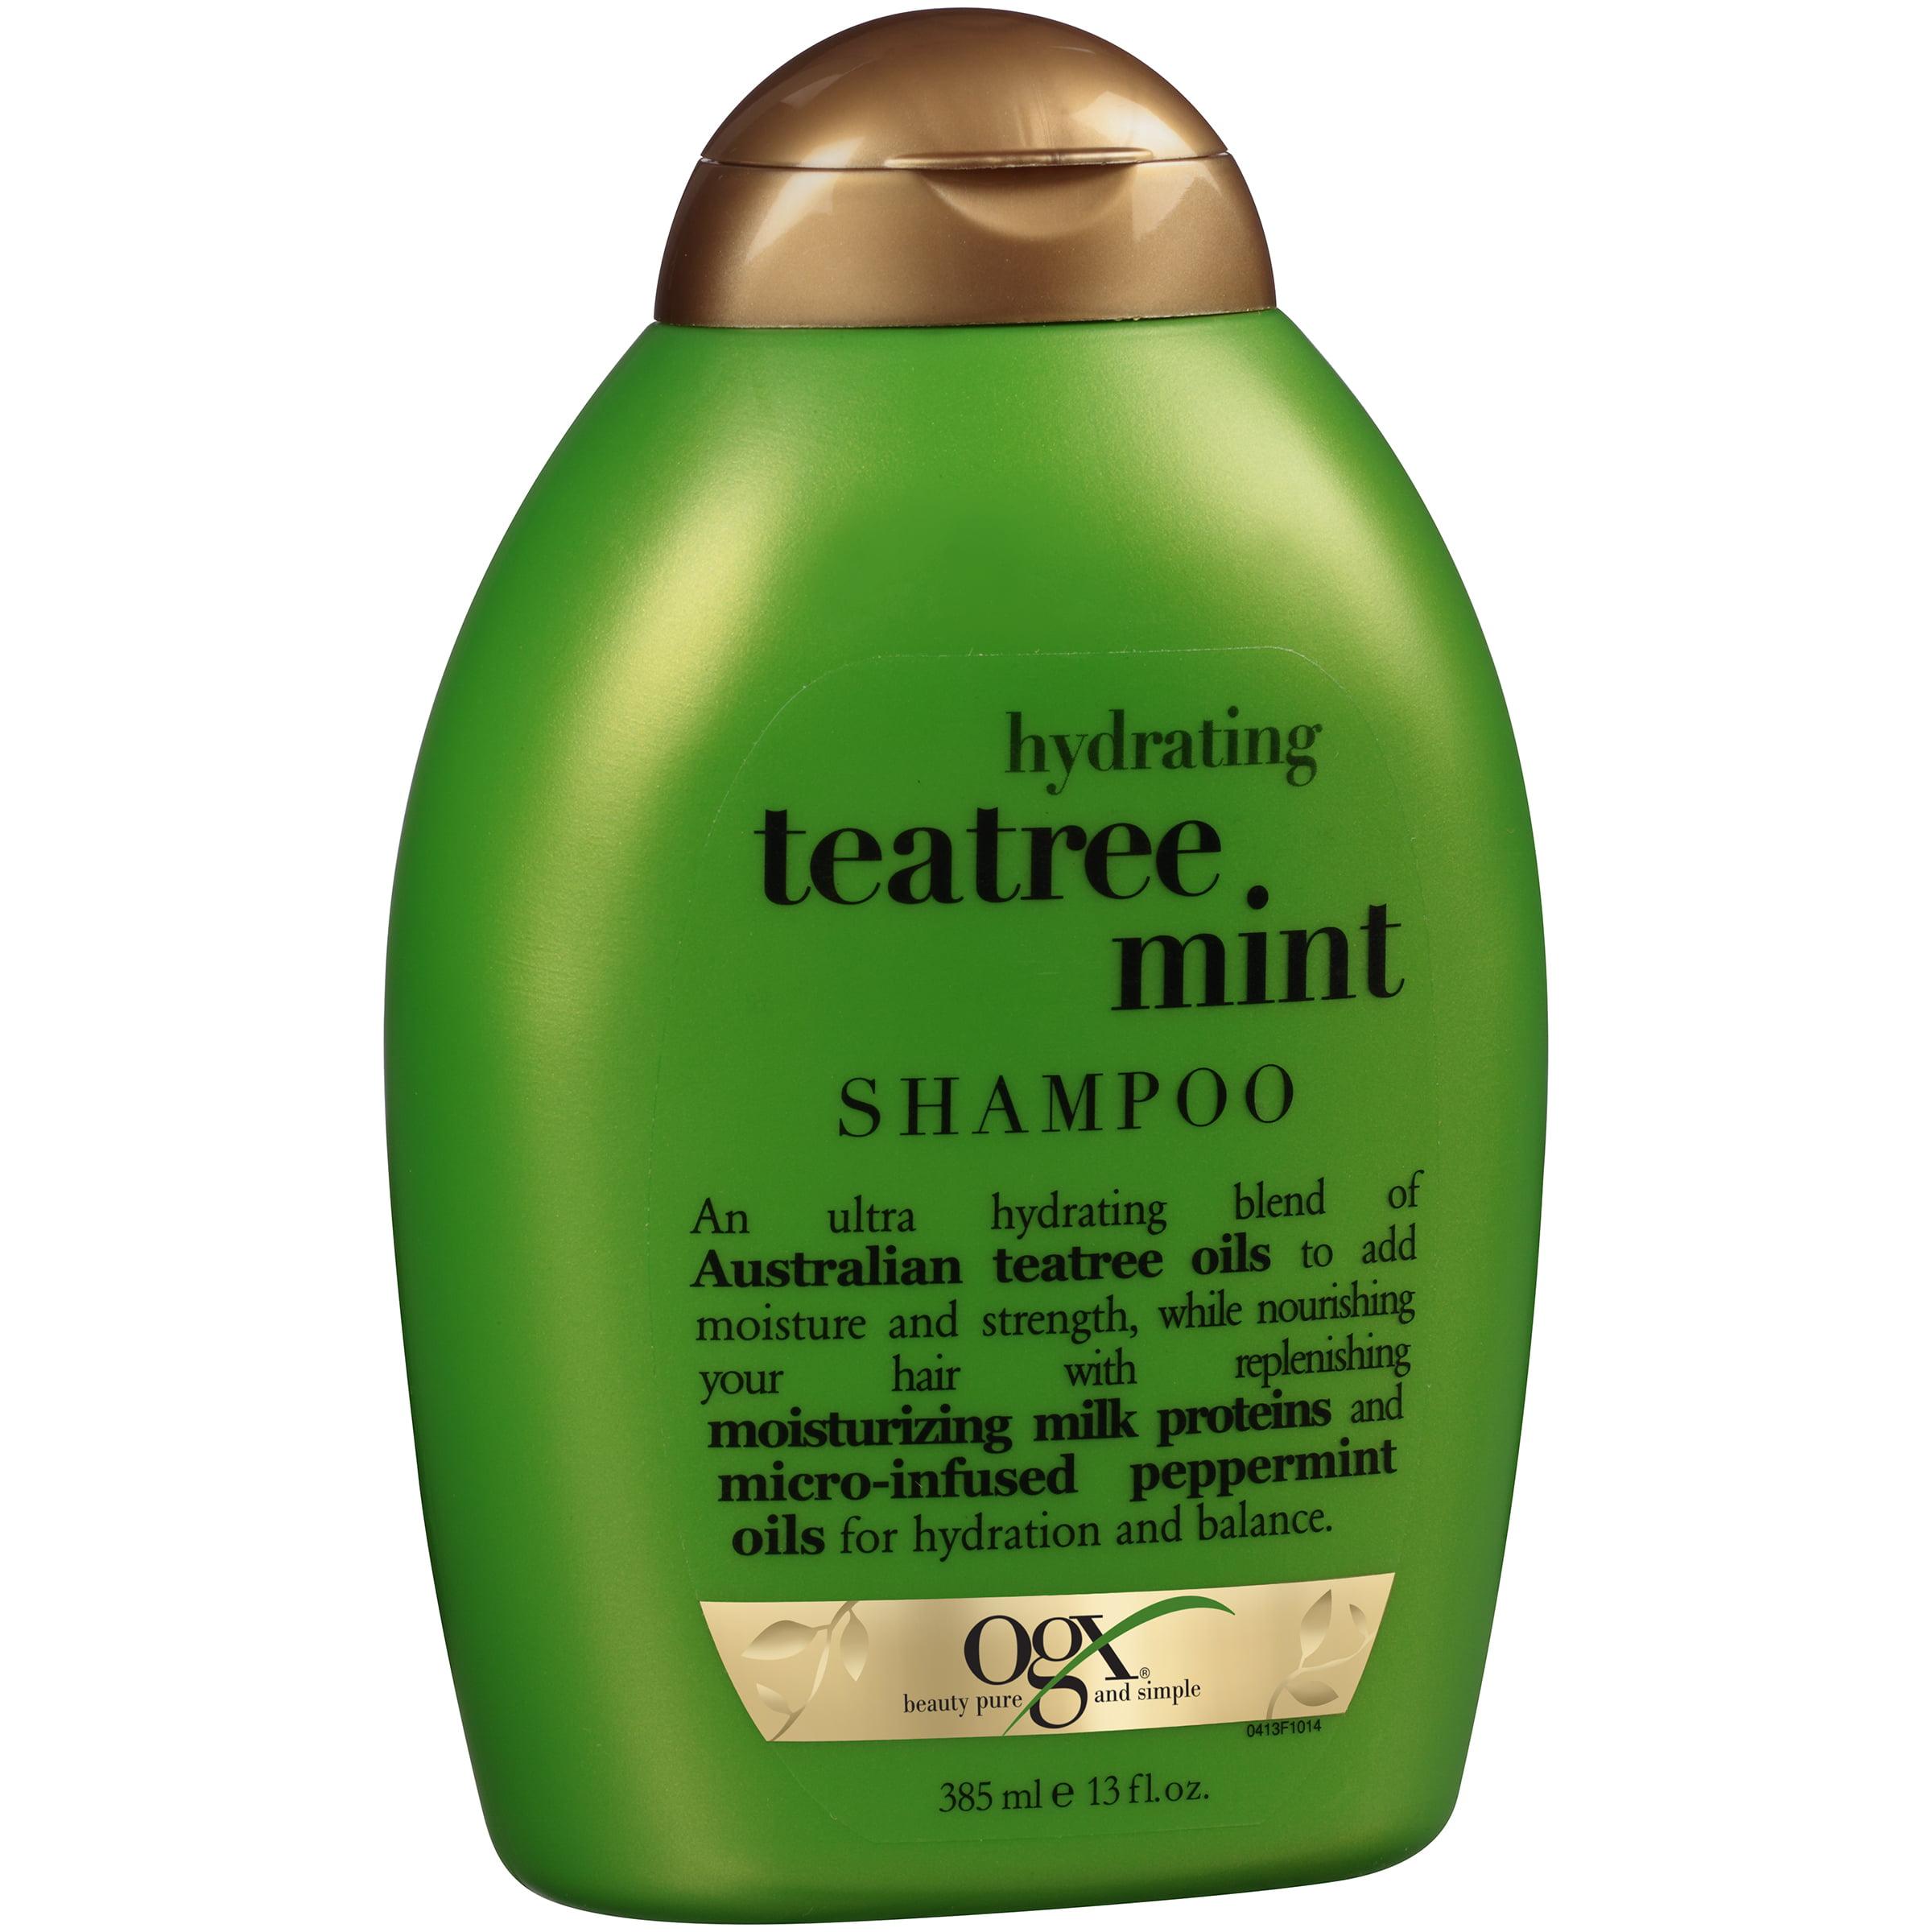 OGX® Hydrating Teatree Mint Shampoo 13 fl. oz. Squeeze Bottle